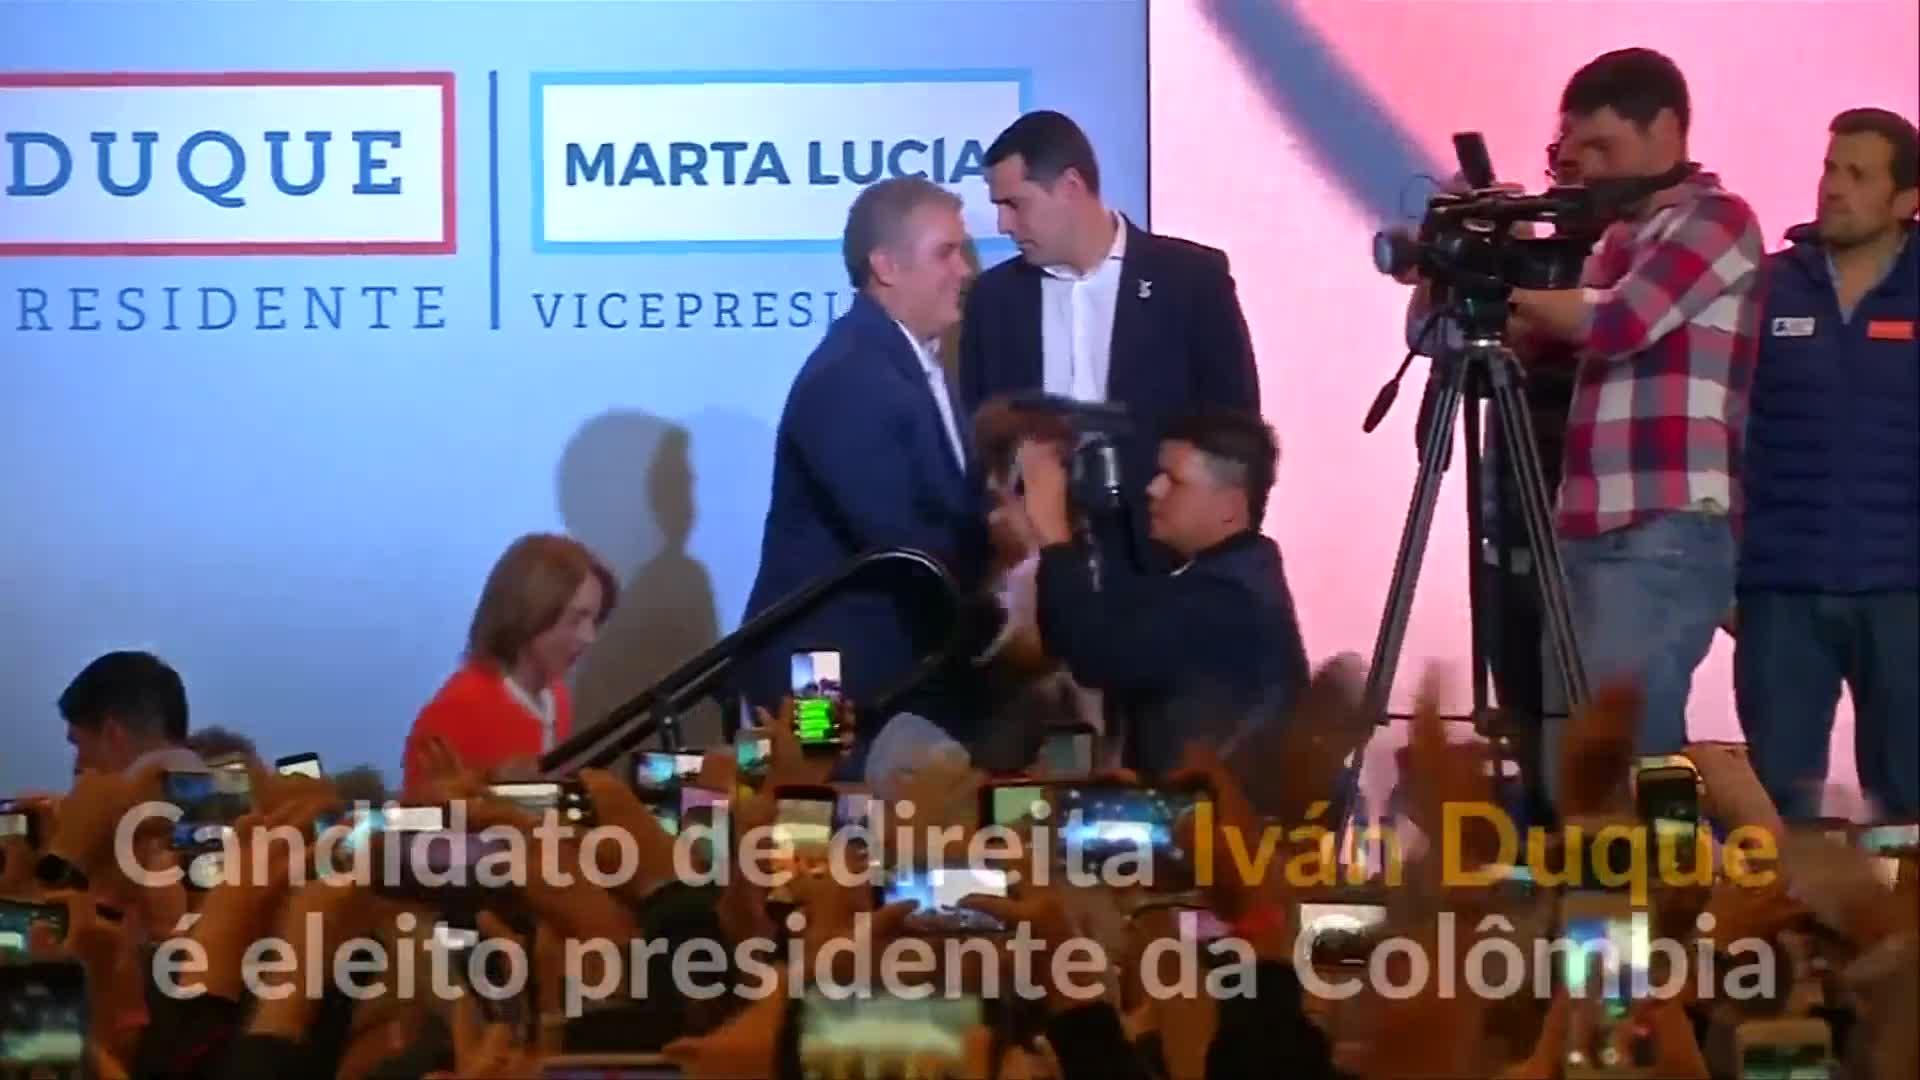 Colômbia: Iván Duque é eleito presidente e pode revisar acordo de paz